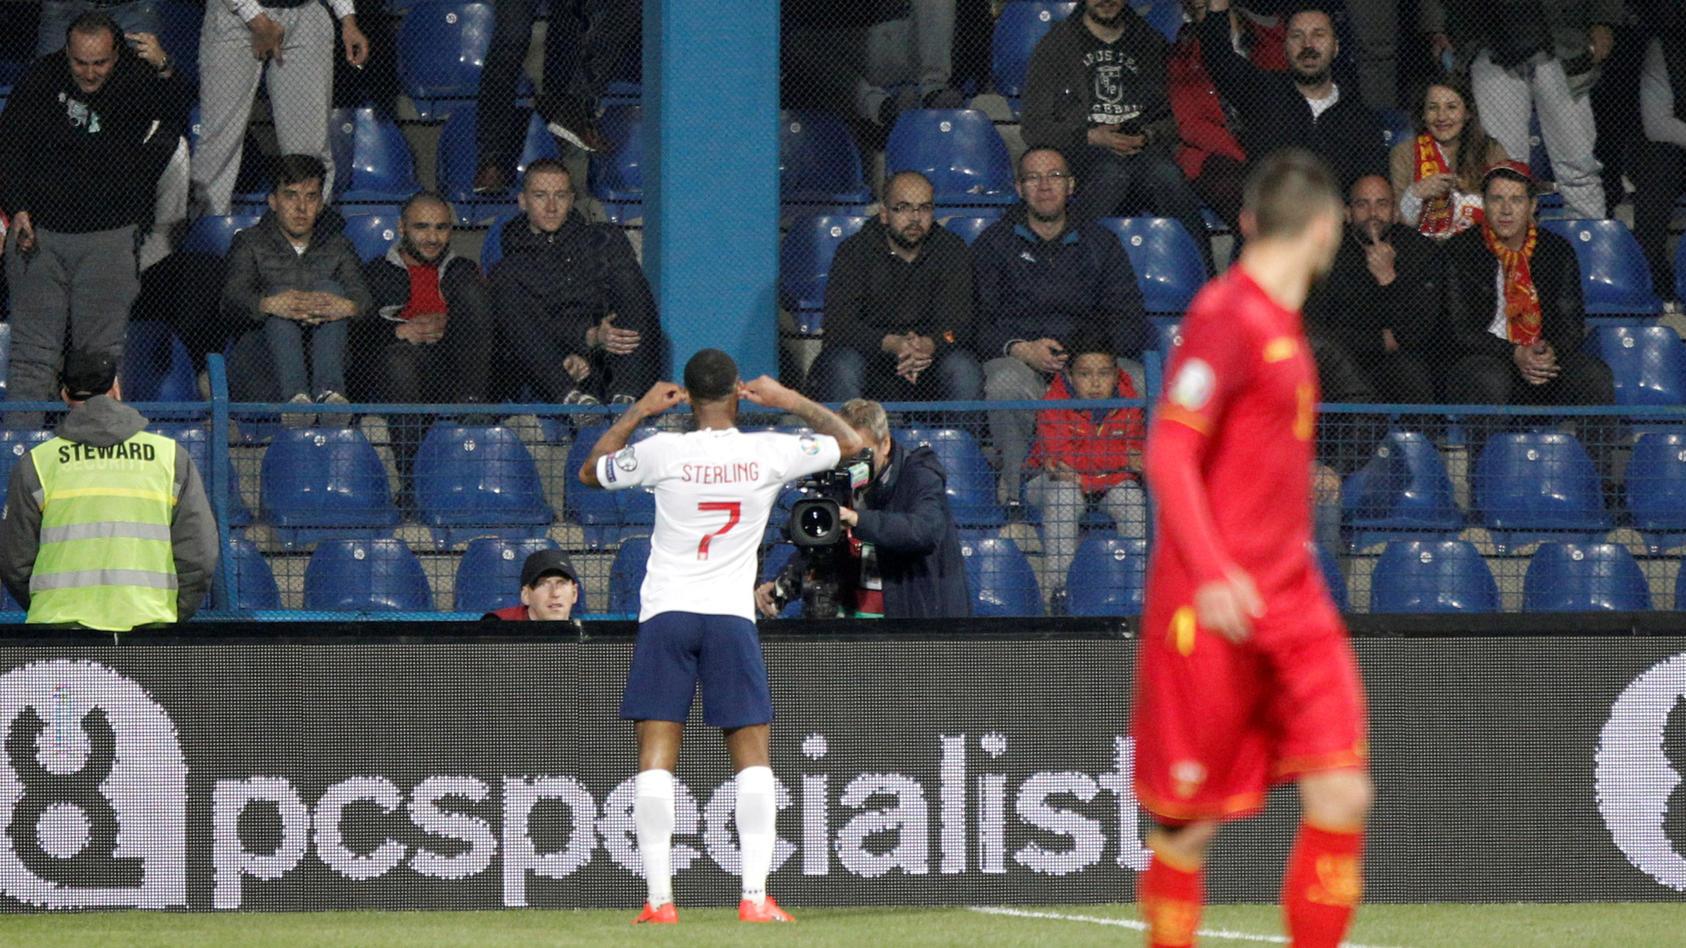 Euro 2020 Qualifier - Group A - Montenegro v England